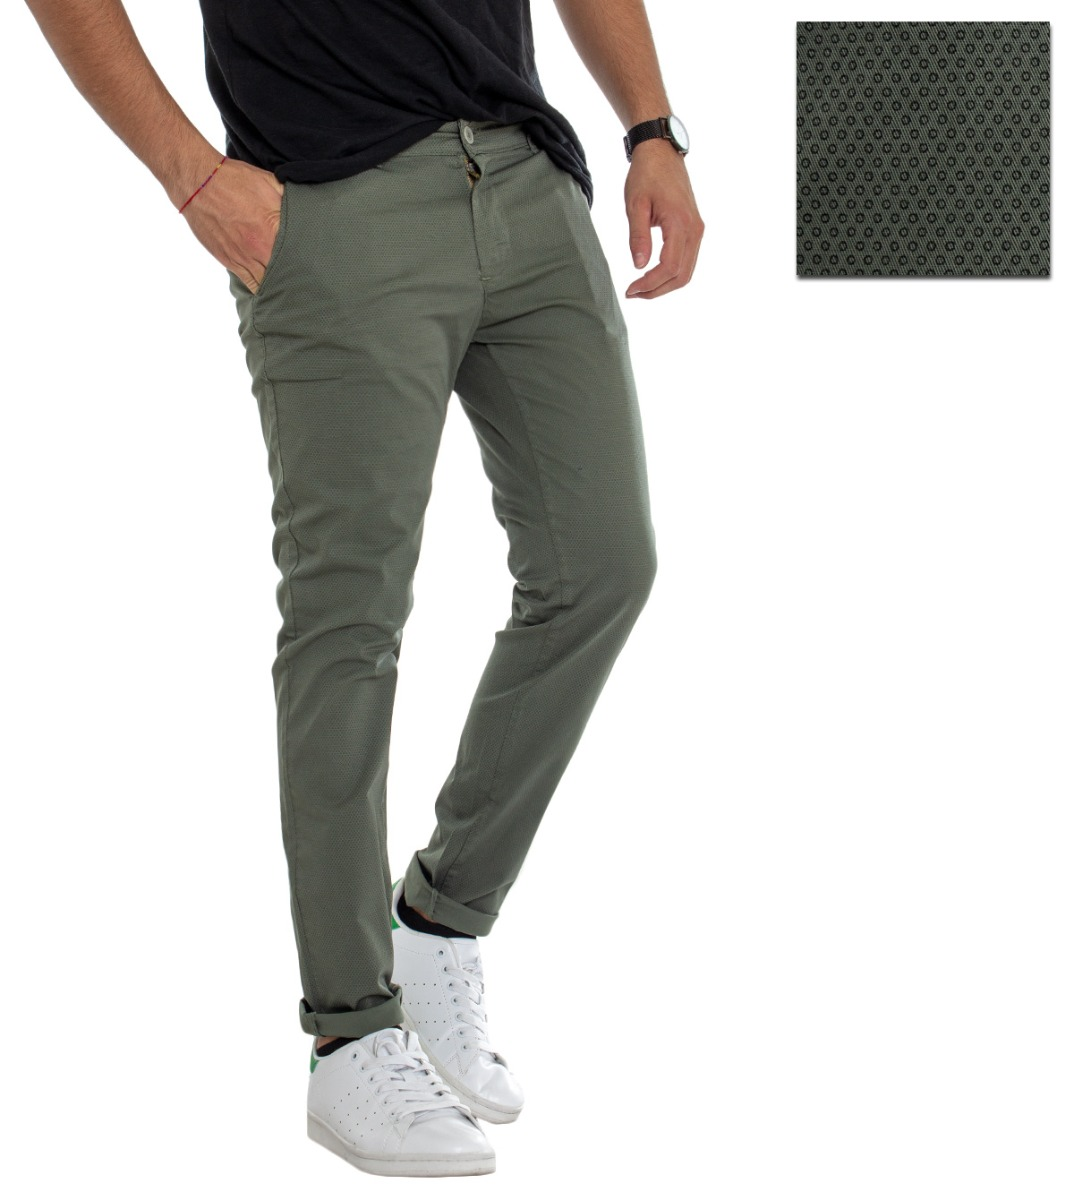 Pantalone Uomo Classico Cotone Pois Micro Fantasia Tasca America Tinta Unita ...